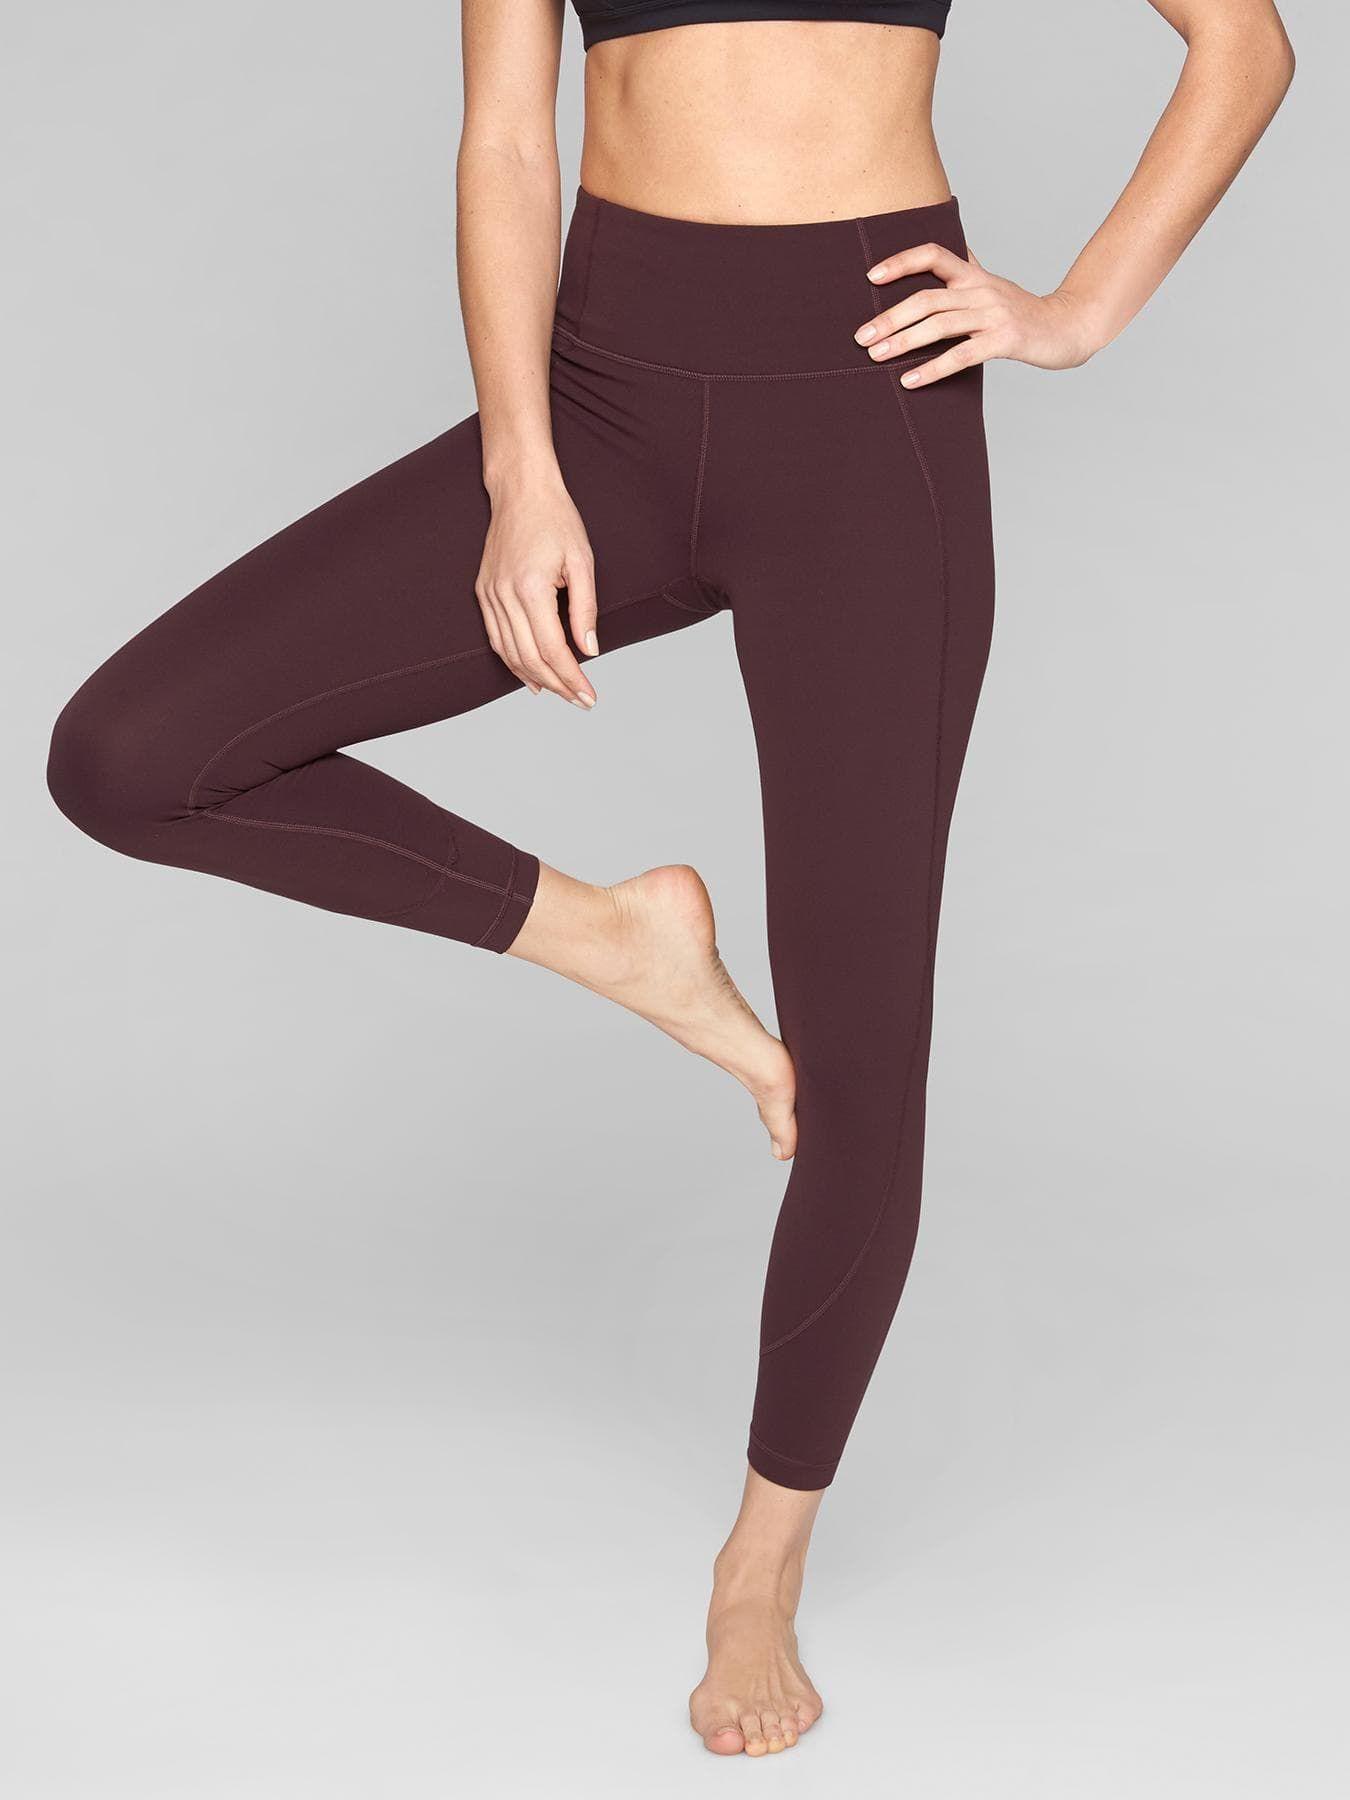 1e88e828ccd10 Athleta Salutation 7/8 Tight Outdoor Yoga, Date Night Dresses, Gym Gear,